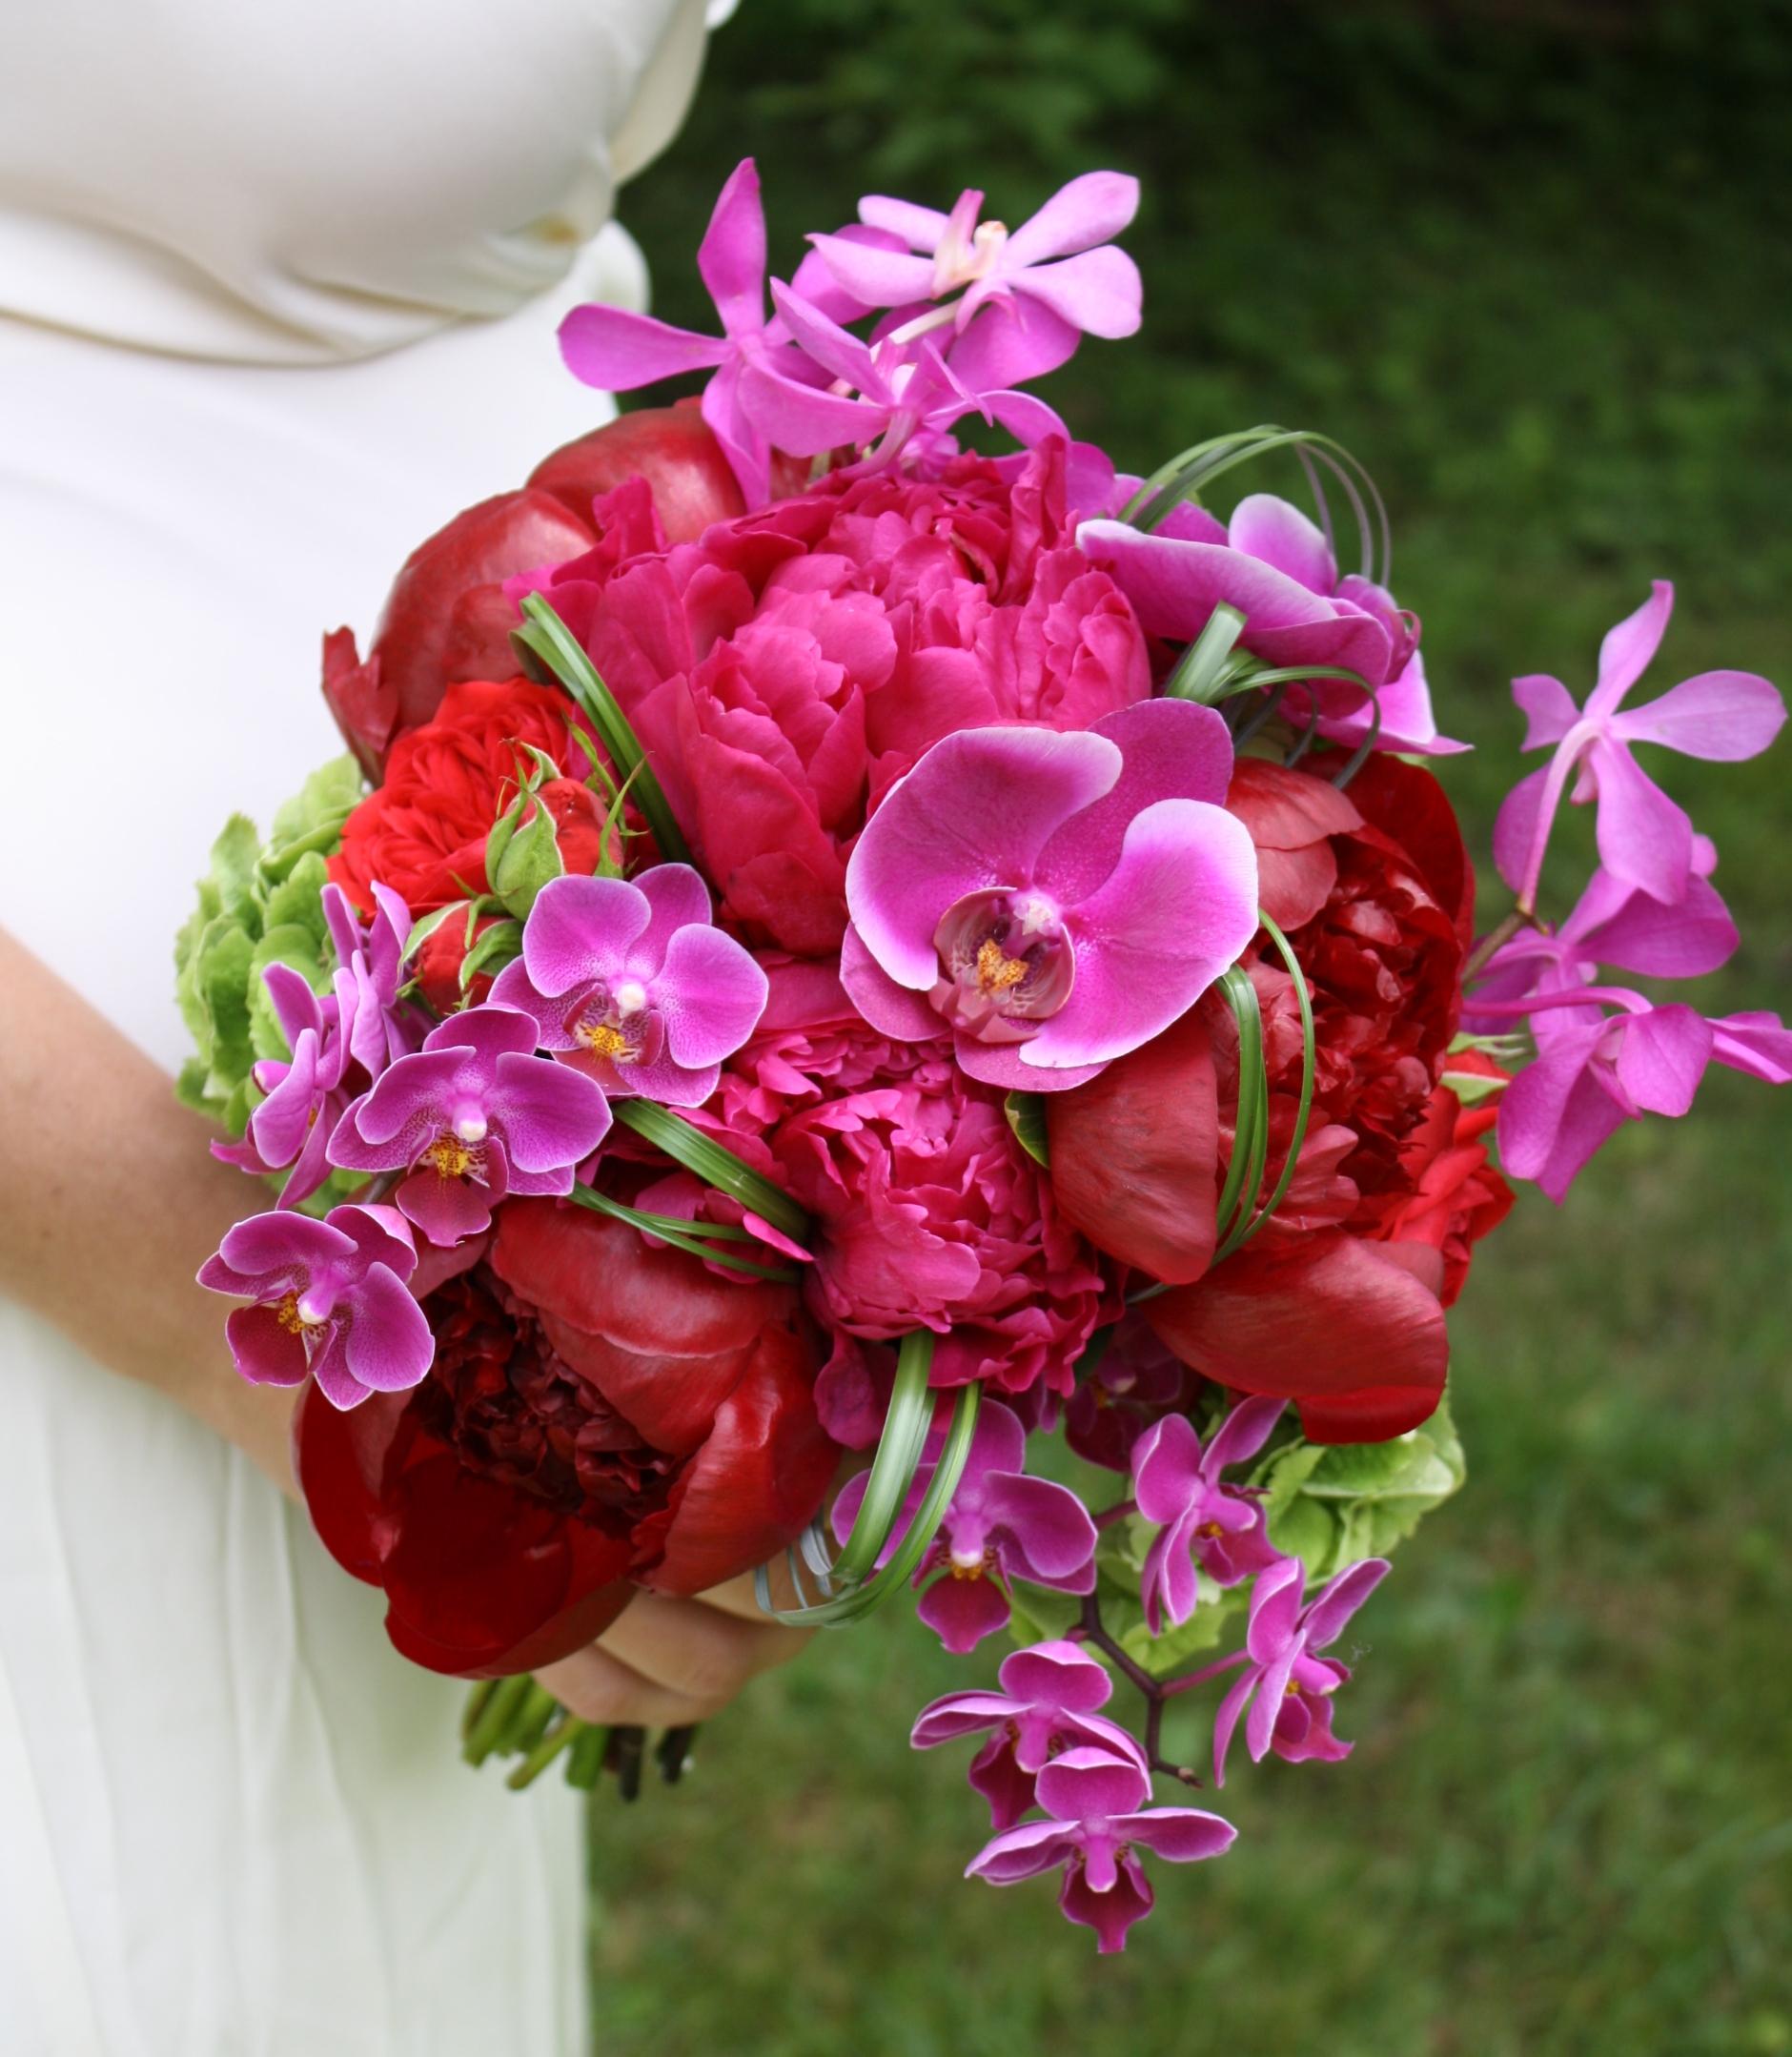 flower bouquets for weddings wedding flower bouquets Wedding Flowers Bouquets